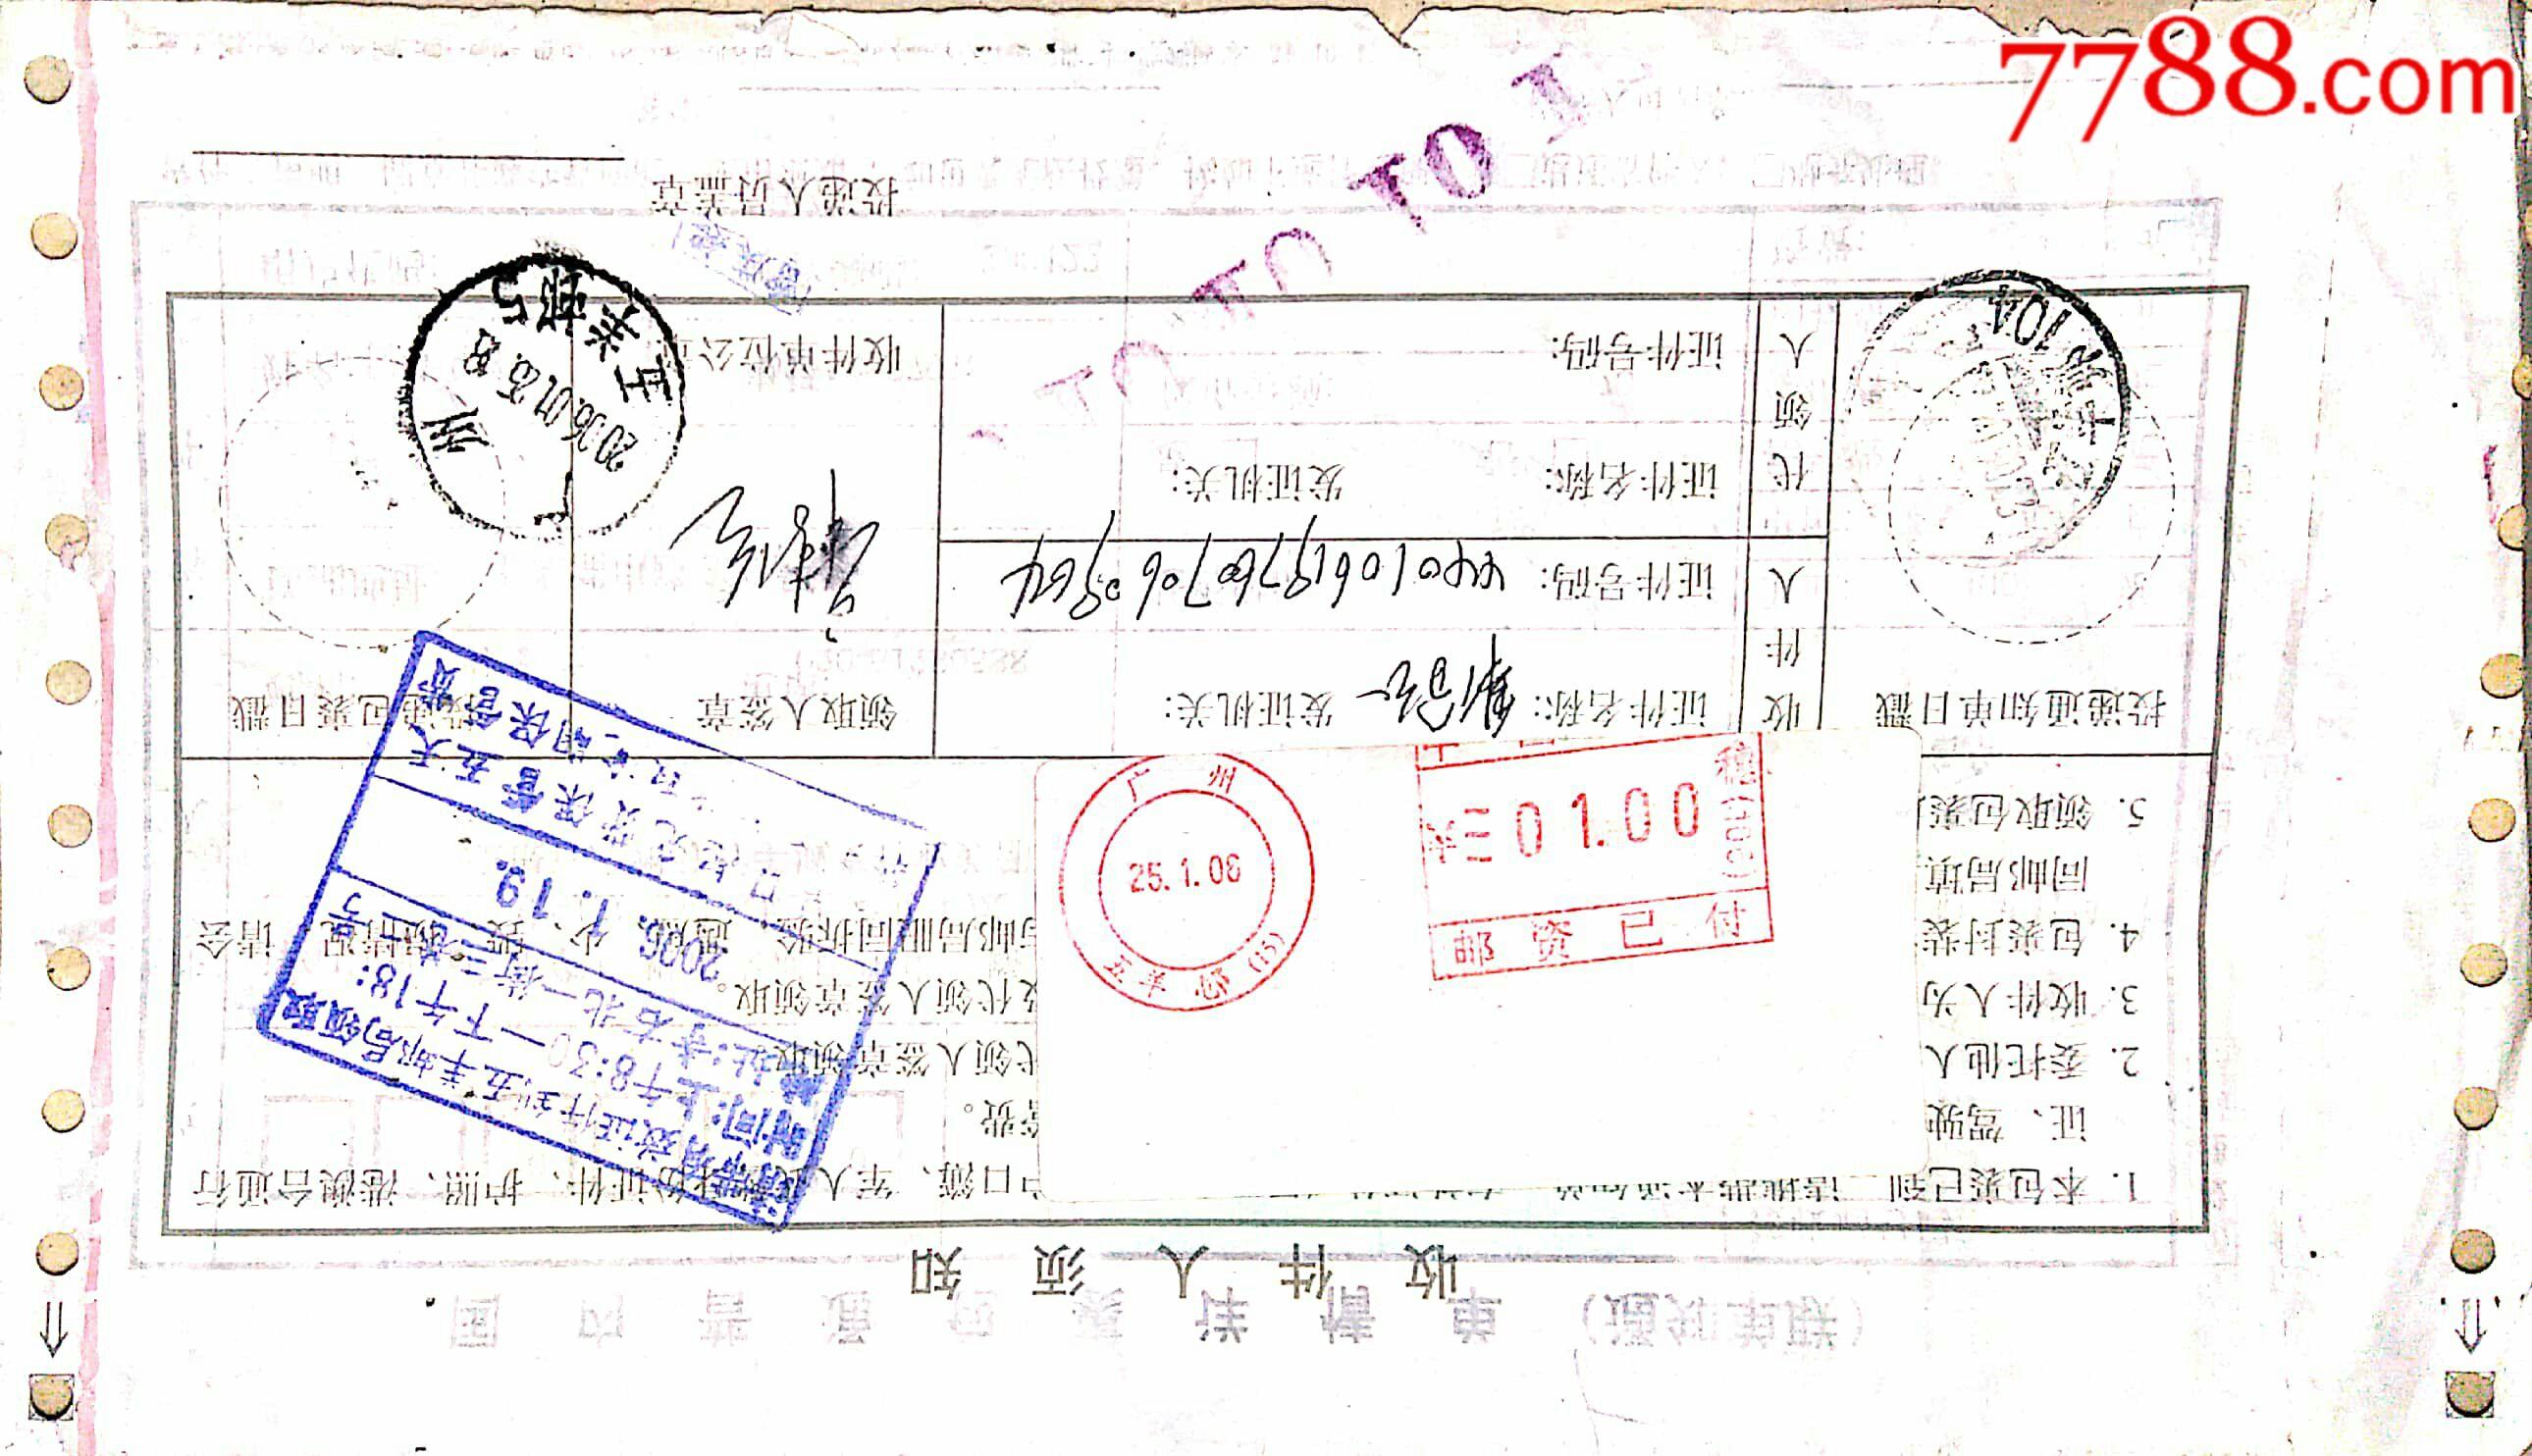 �p圈�]�Y已付�]�Y�C包裹通知��_�V州五羊�(au20667151)_